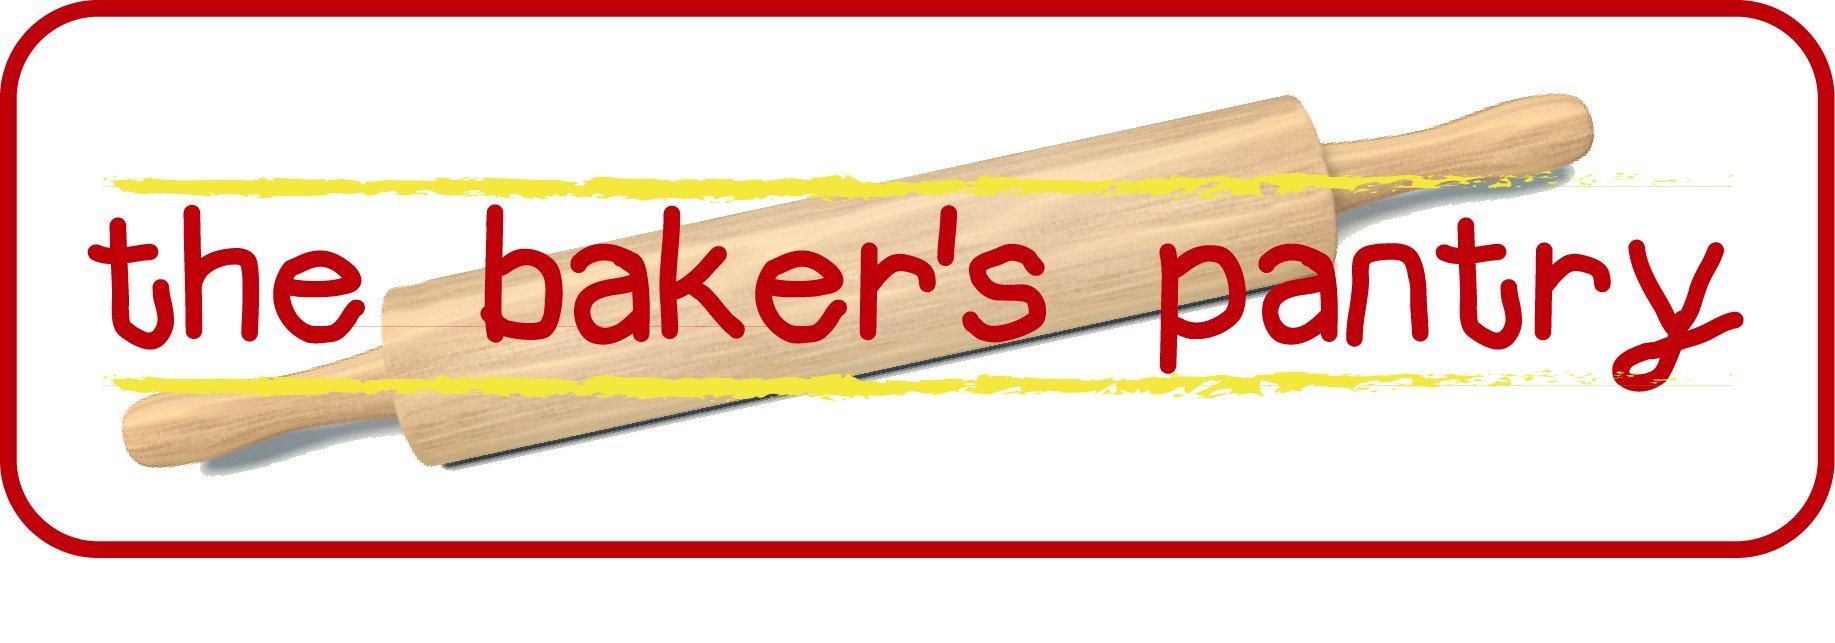 Cupcake Boxes, Cupcake Containers, 12 Pack Cupcake Containers, Set of 12,by the Bakers Pantry by The Bakers Pantry (Image #2)